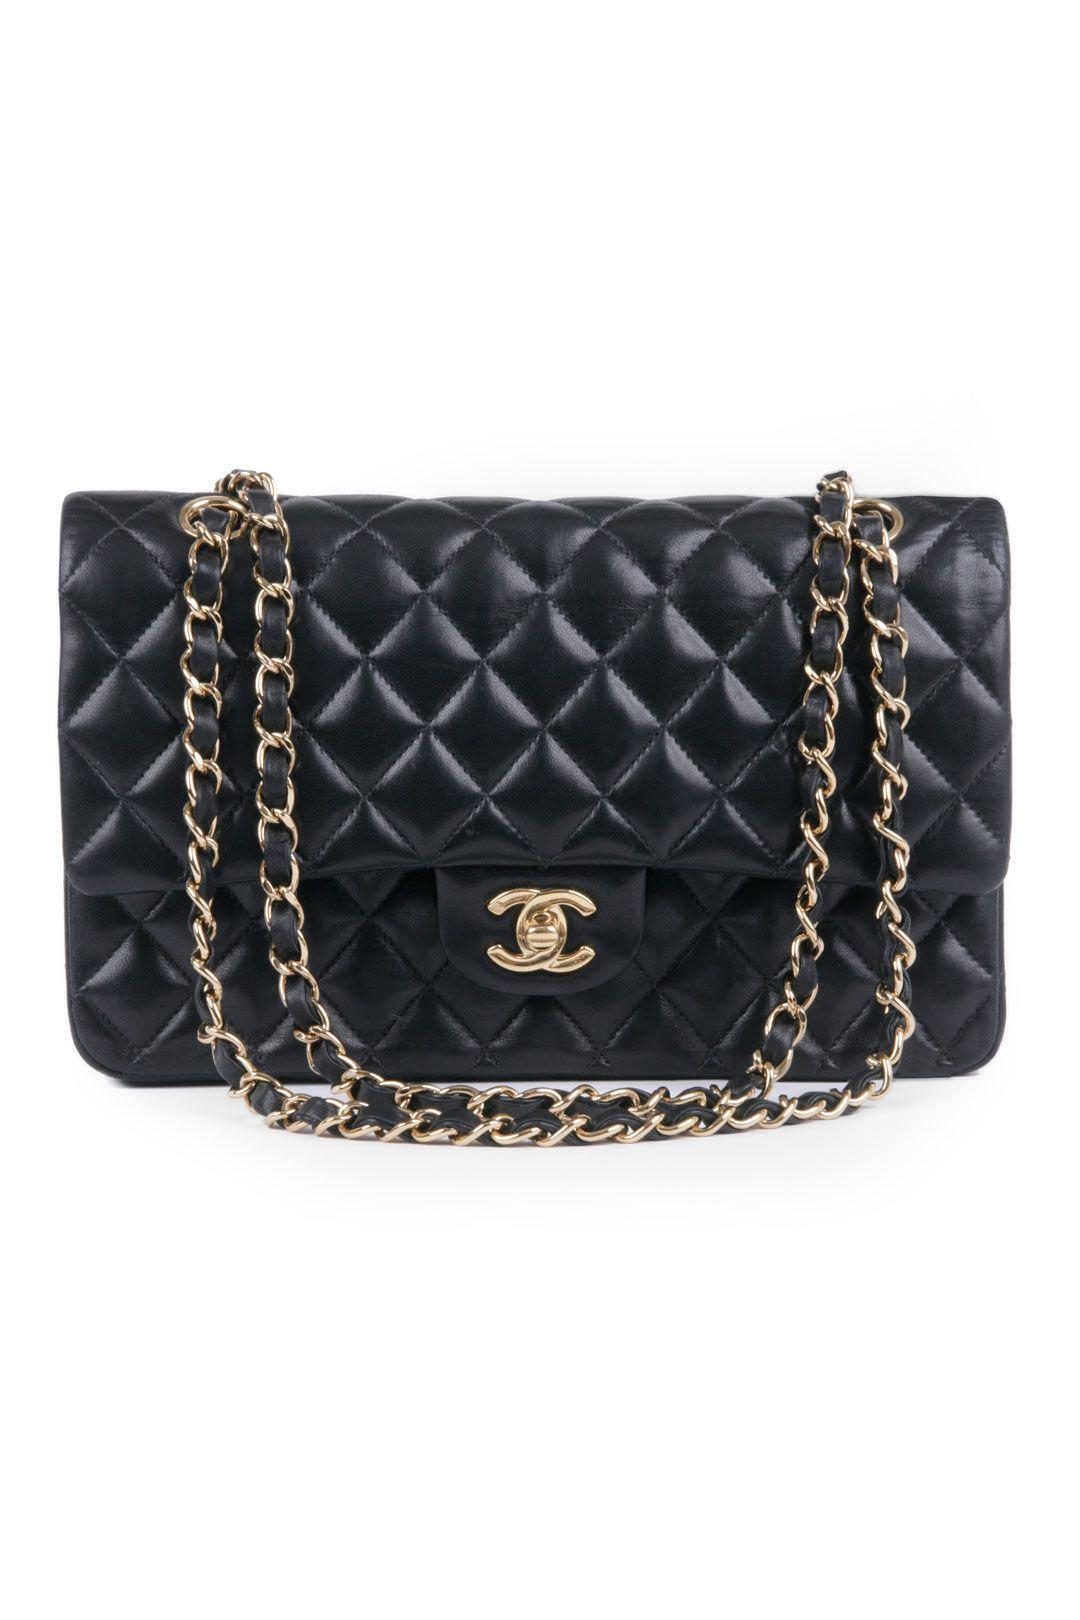 9207b9d8f2ed WGACA Vintage Vintage Chanel Classic Black Coco Bag   For Myself ...